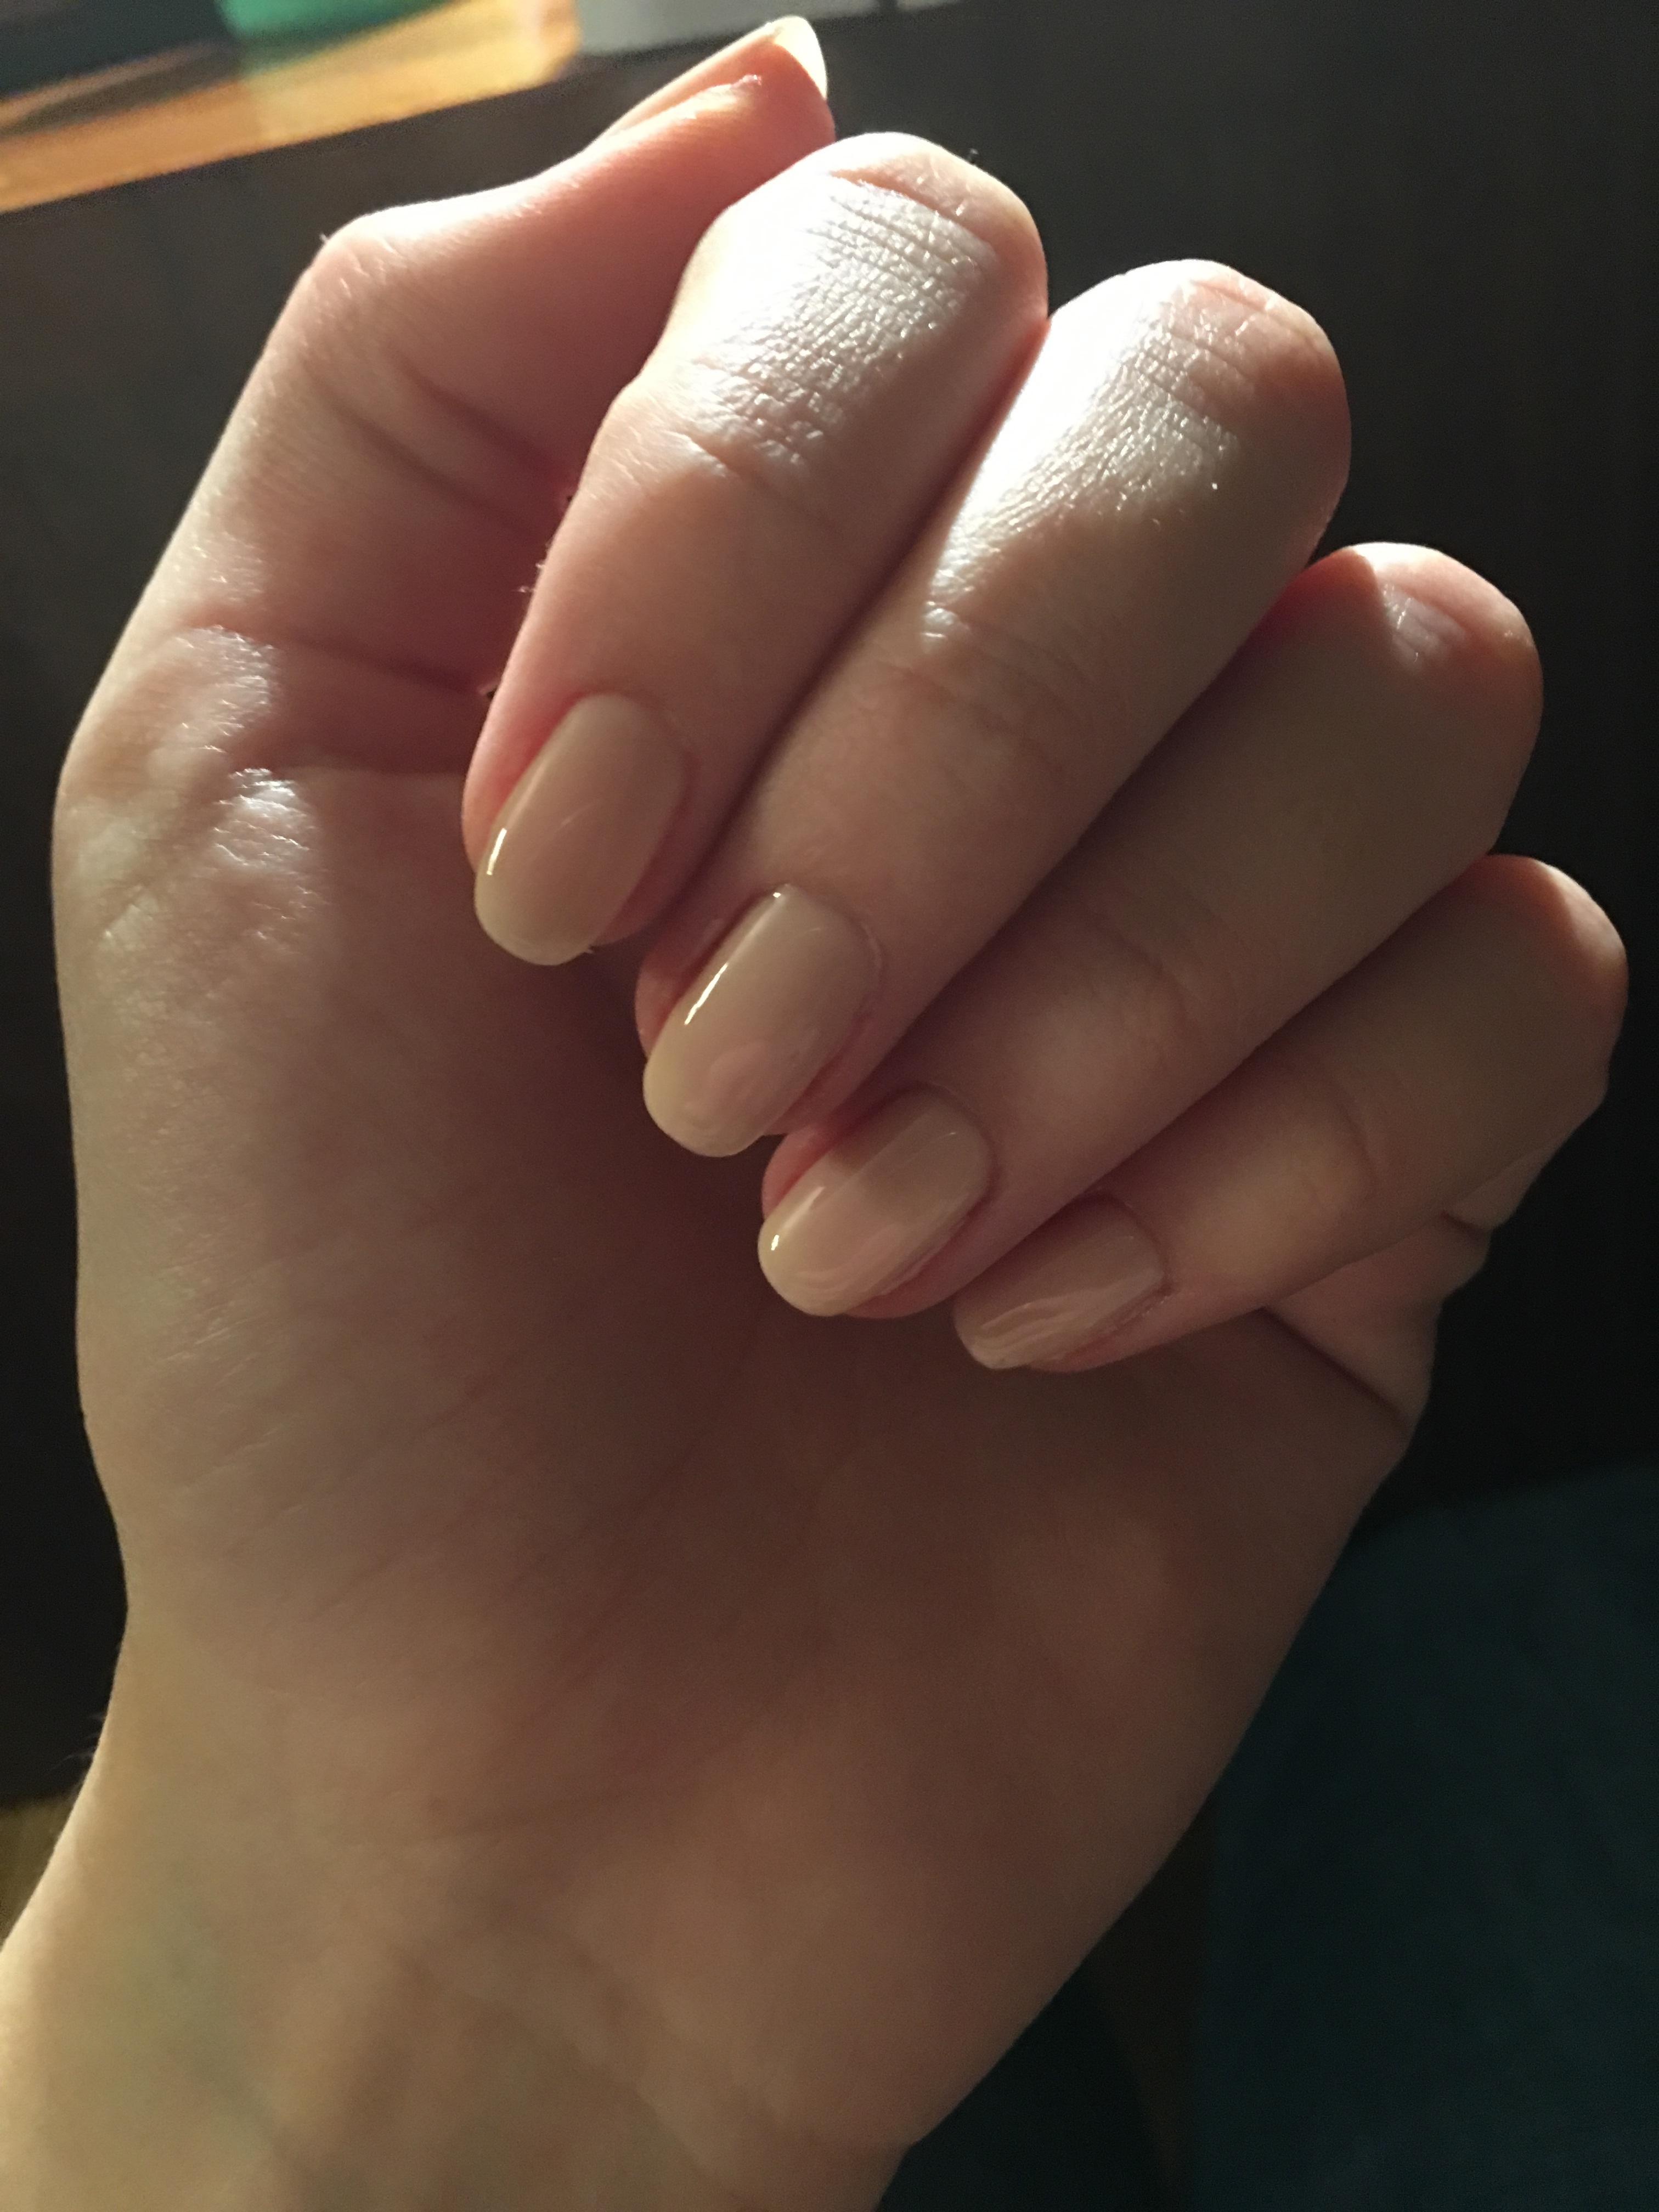 Free Images : leg, finger, paint, arm, lip, painting, manicure, nail ...